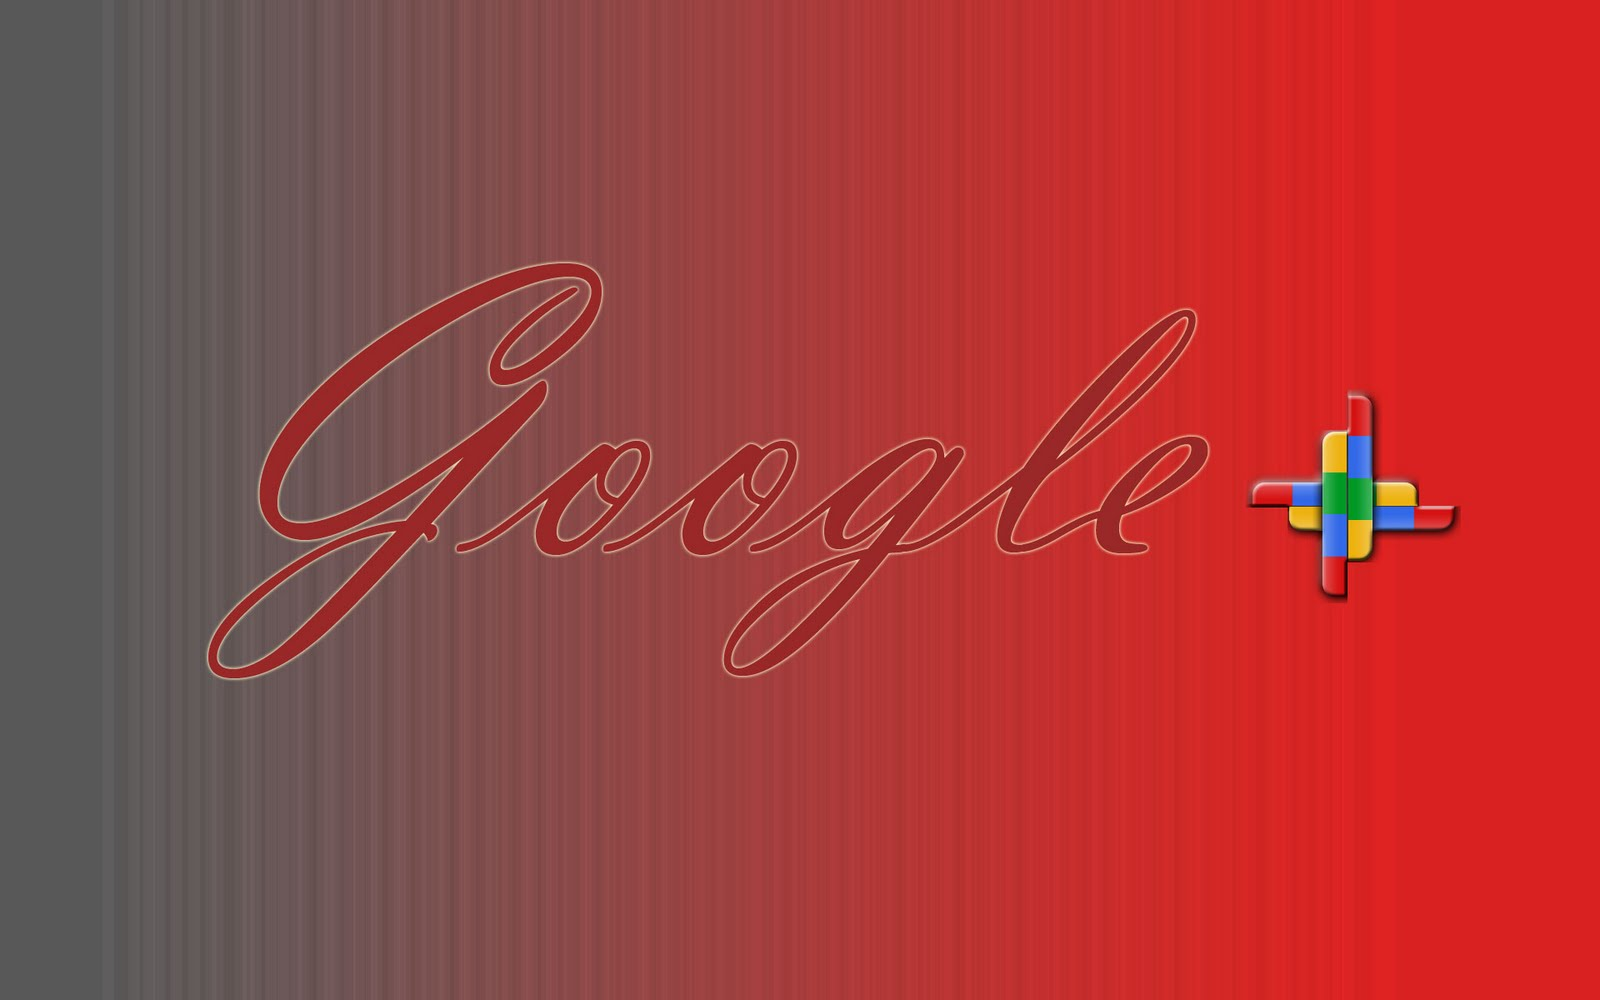 http://1.bp.blogspot.com/-1lZN9i1x7k4/TleJnYP-5zI/AAAAAAAAAjQ/yYbzGHbuDGg/s1600/google_plus_wallpaper-28.jpg